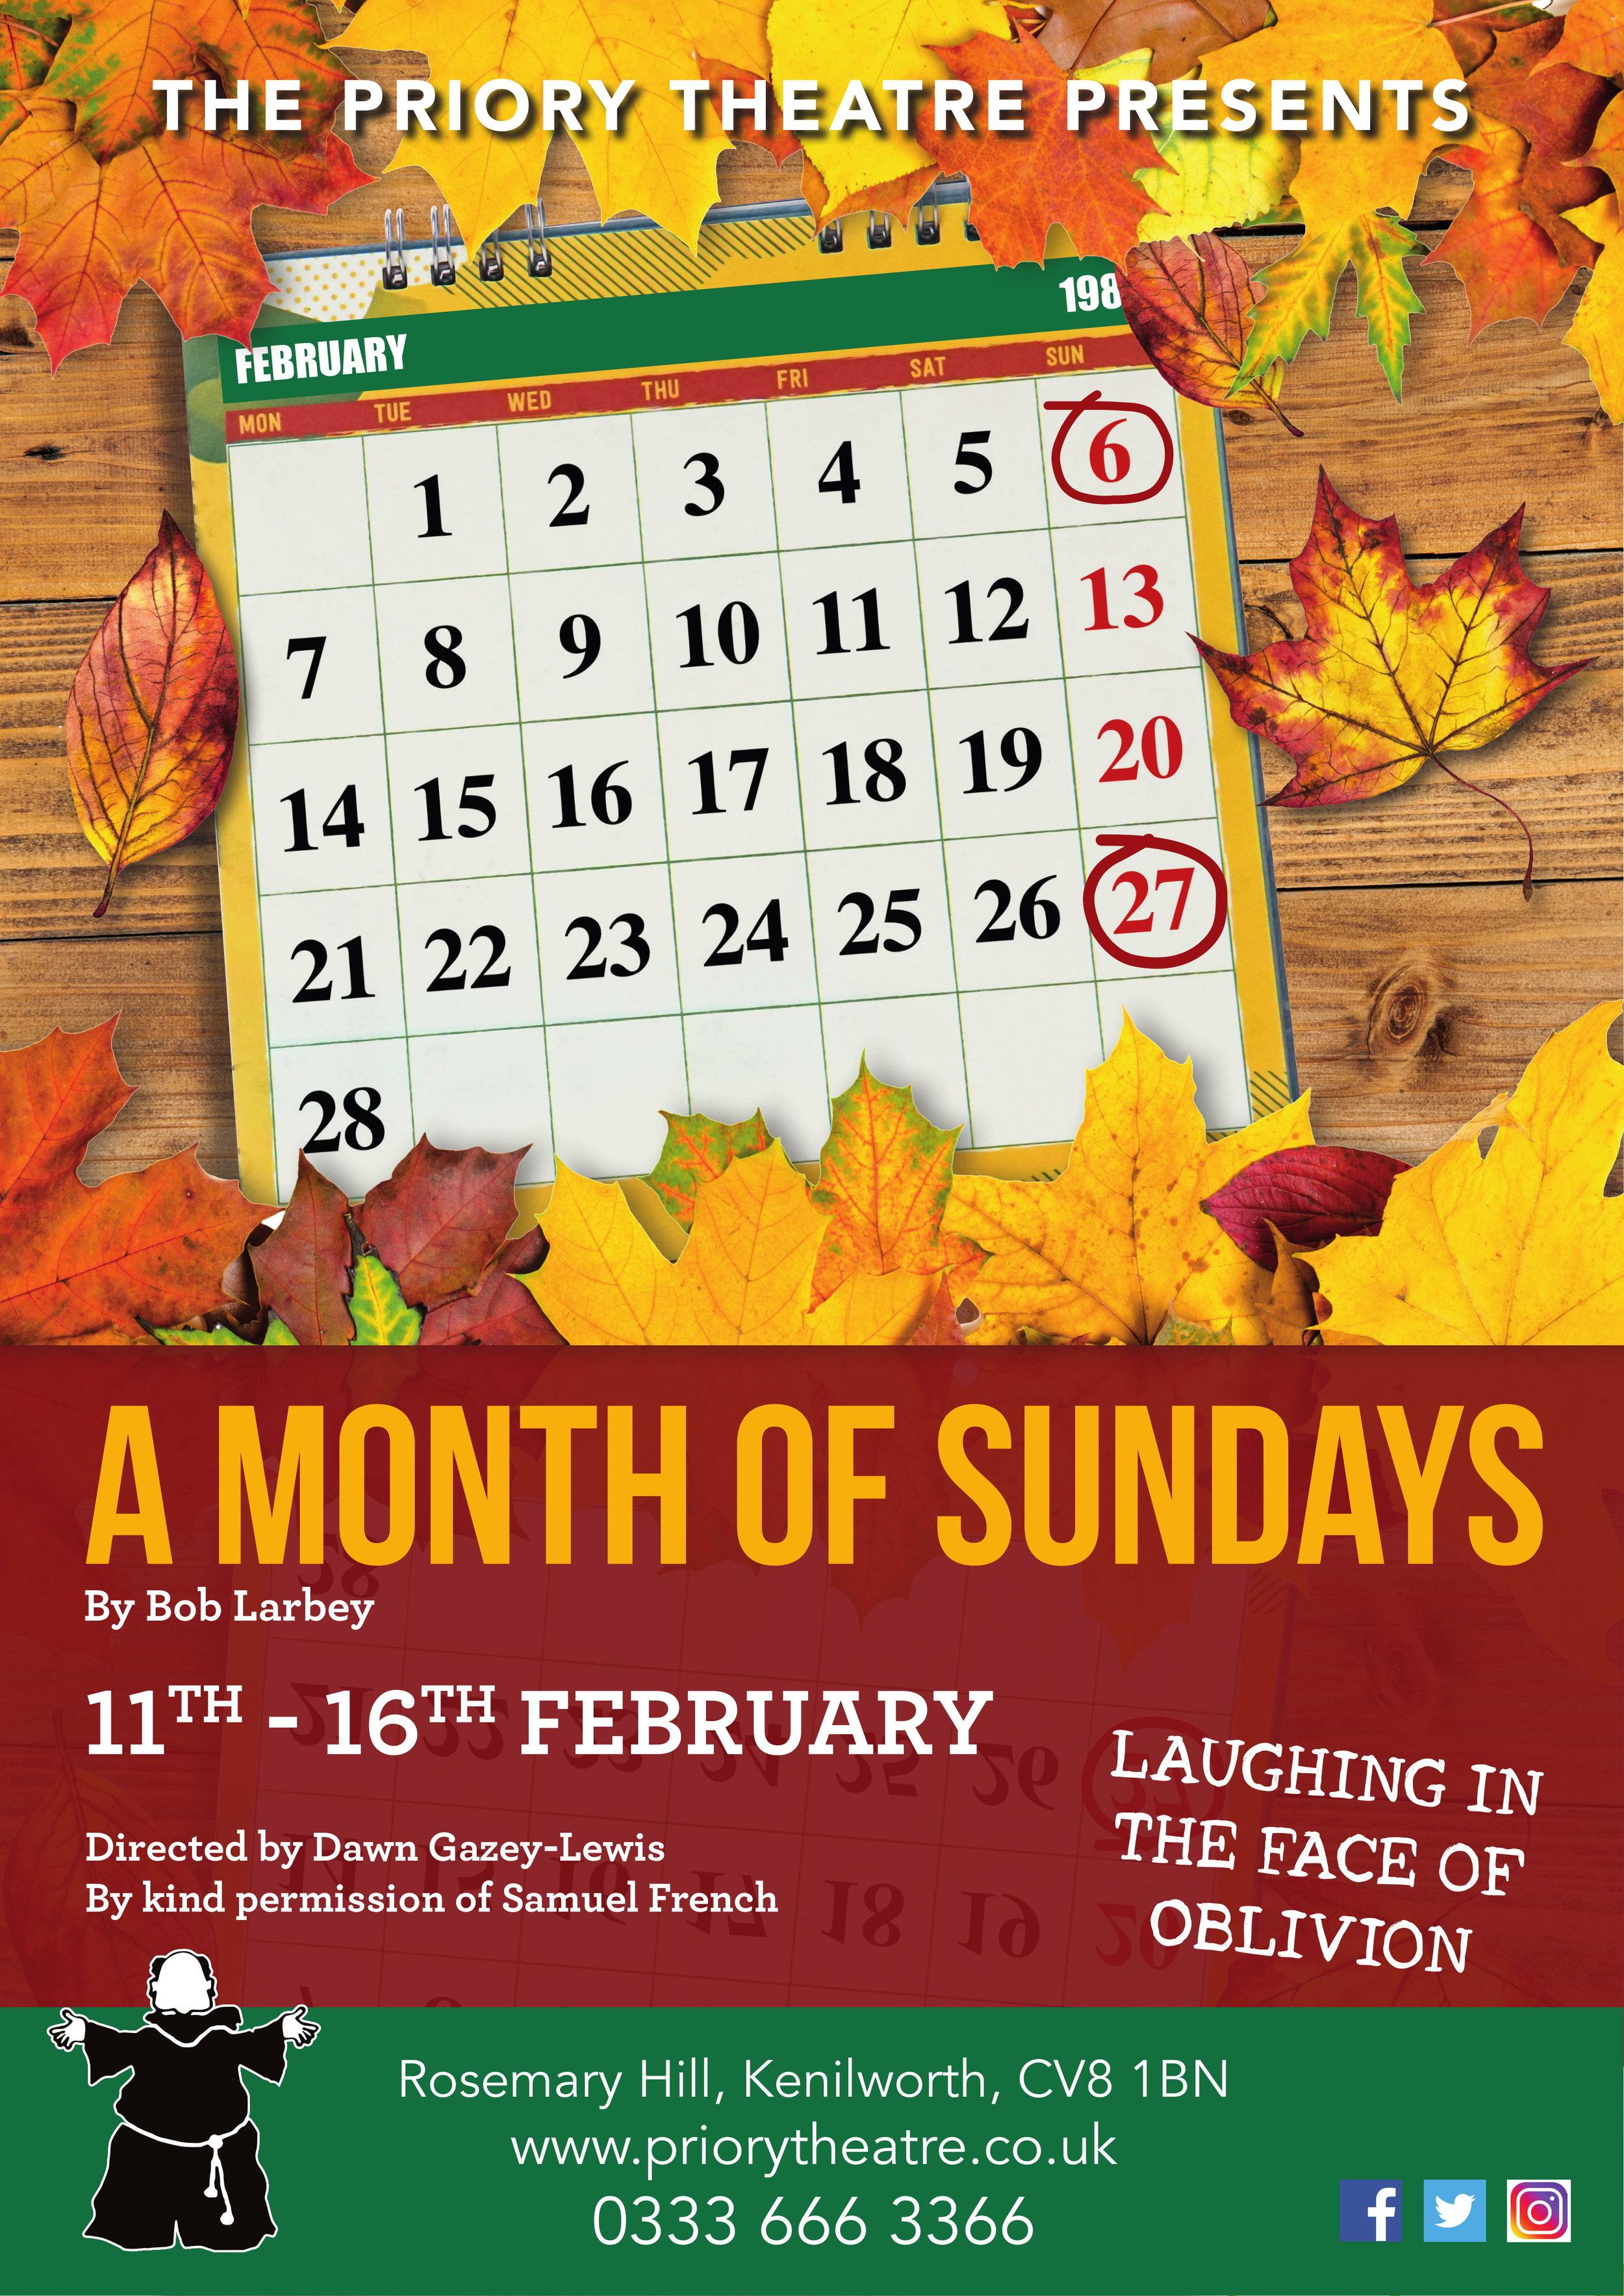 1 A Month of Sundays Poster-1.jpg